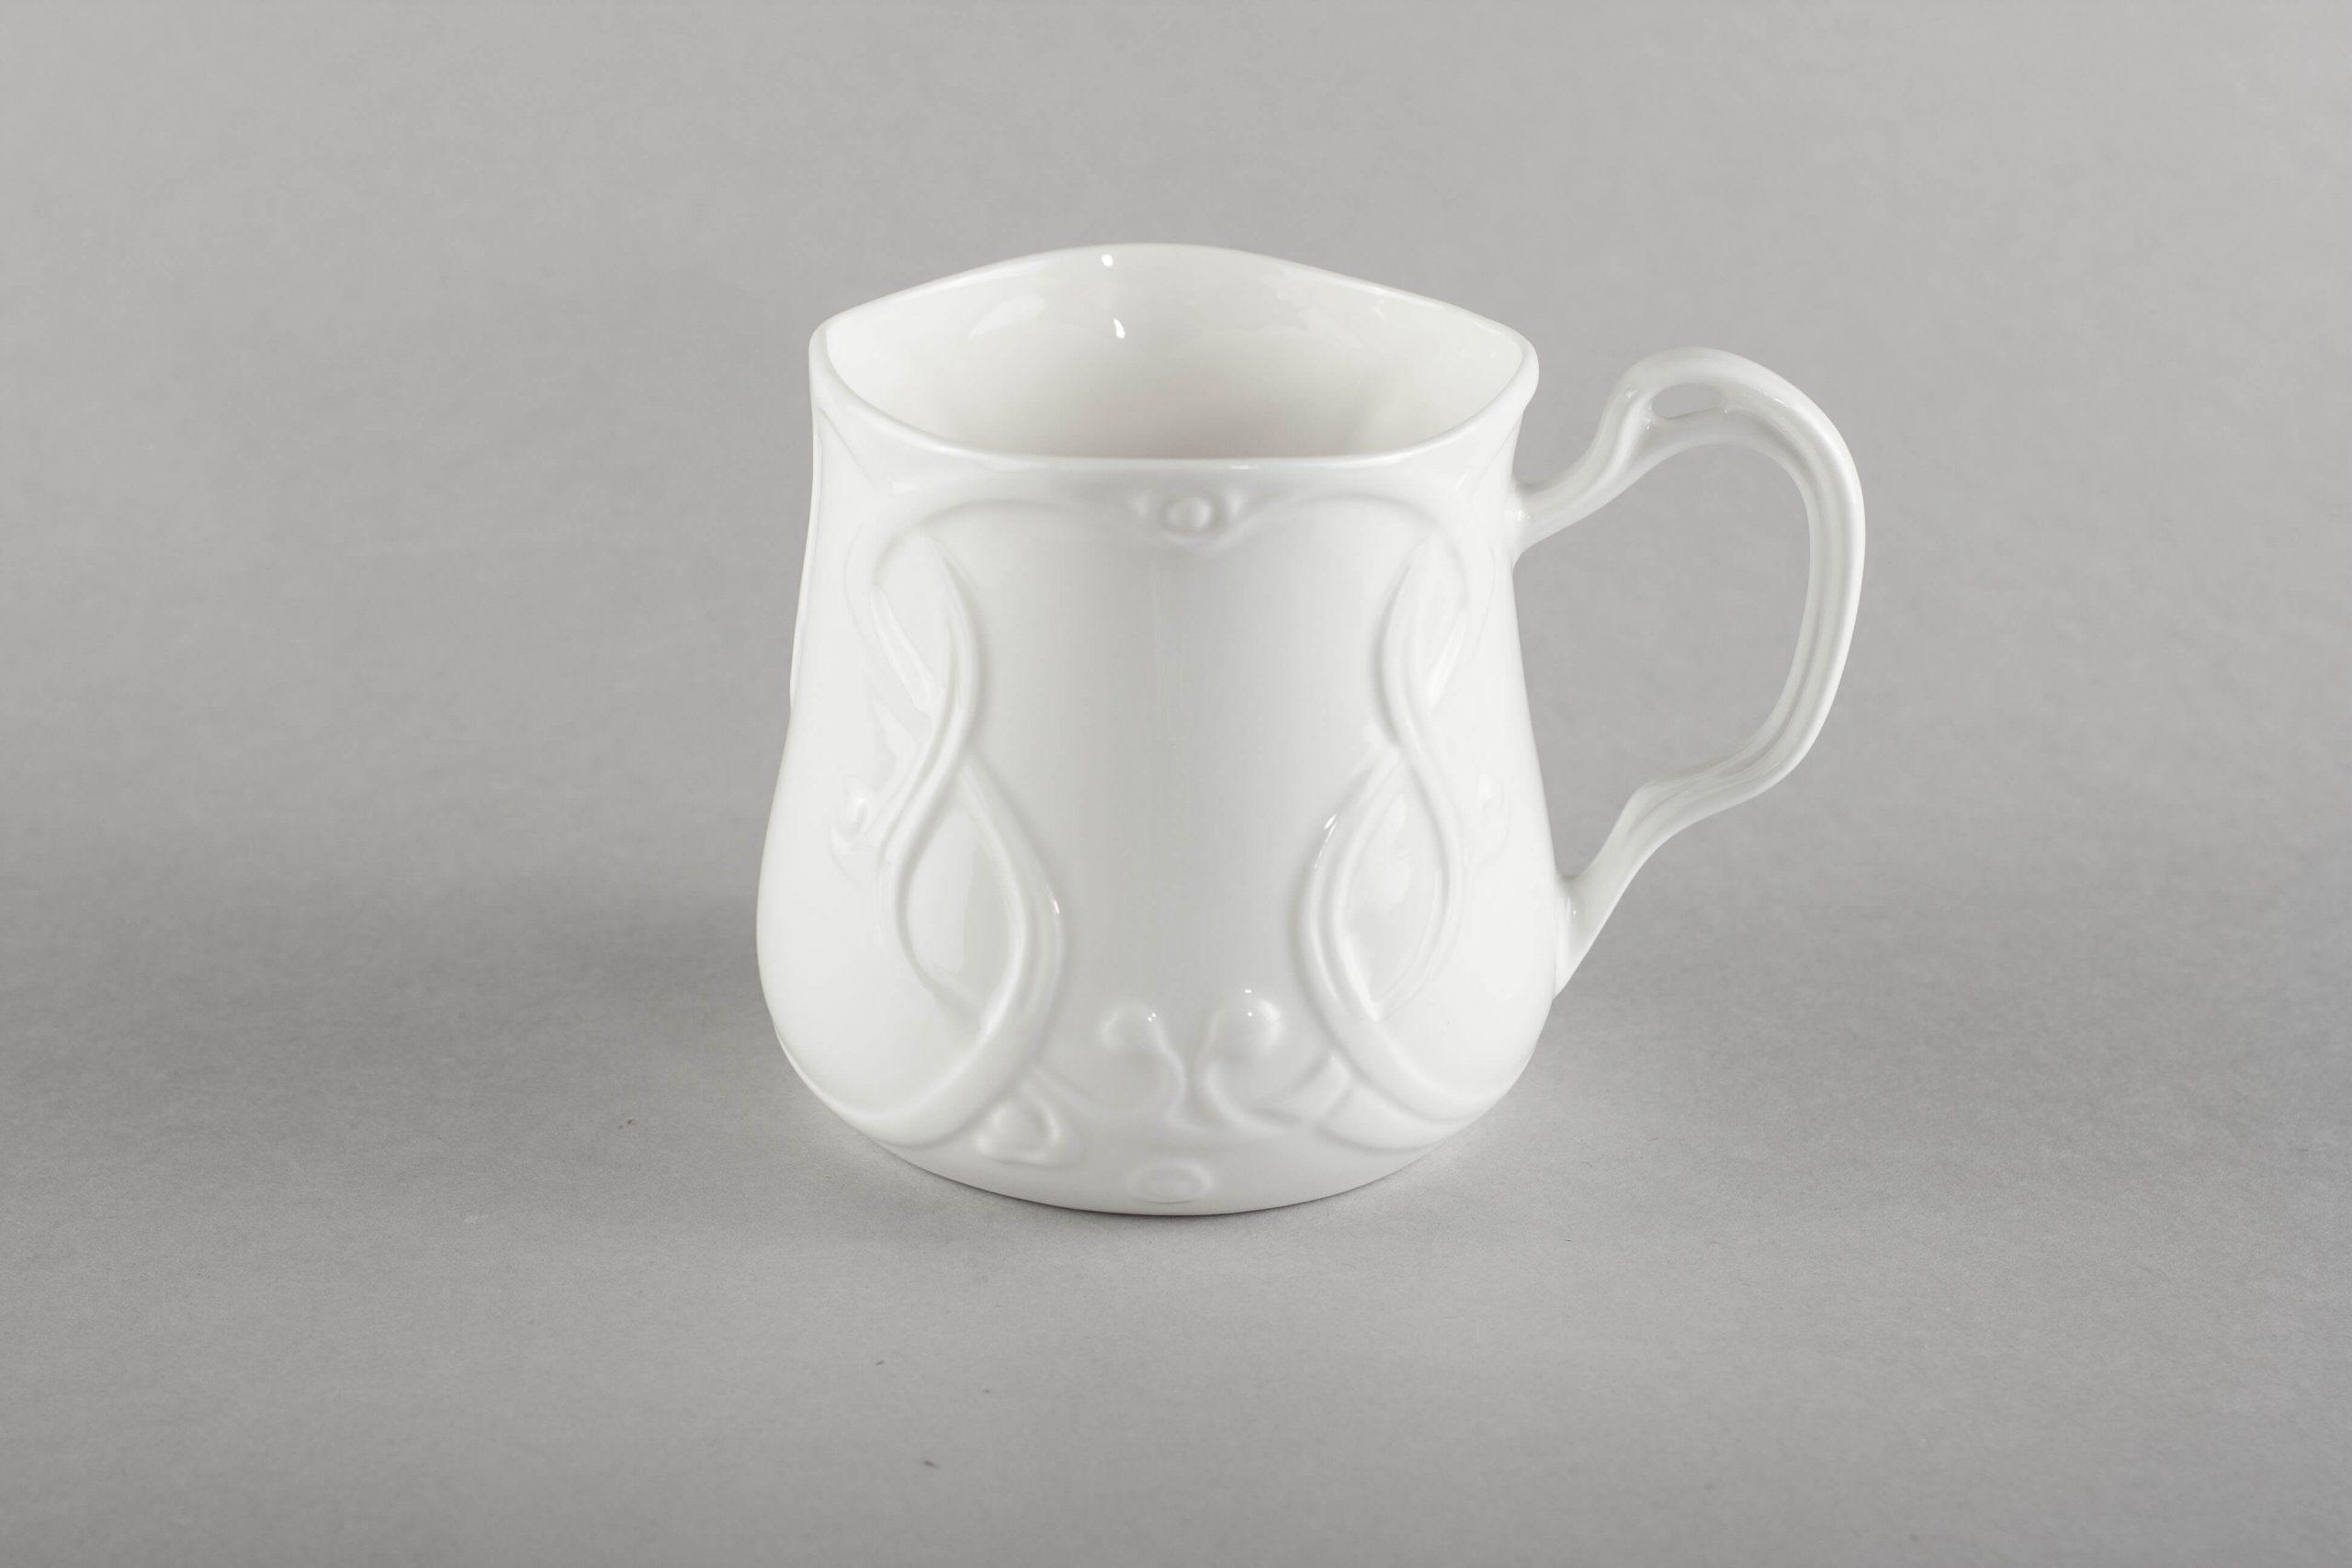 Piebalgas porcelain baltic design 1 scaled Piebalga Porcelain